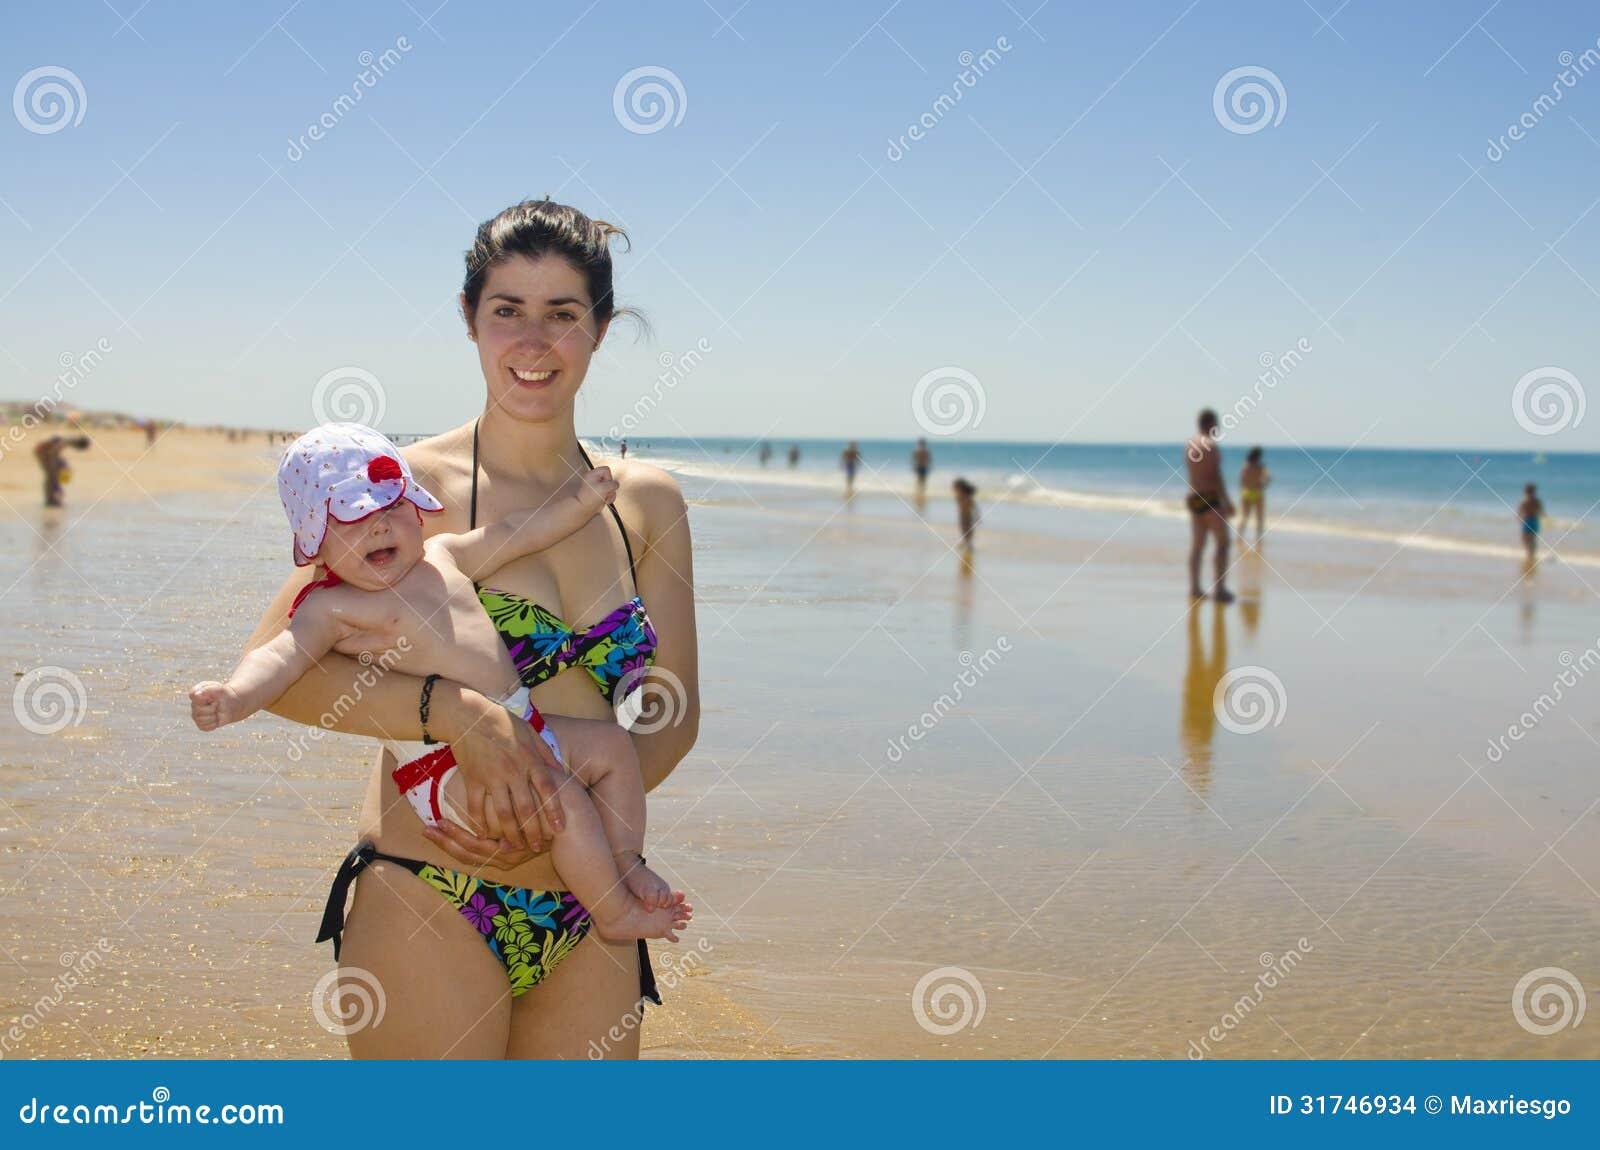 Mom beach 3d images 93